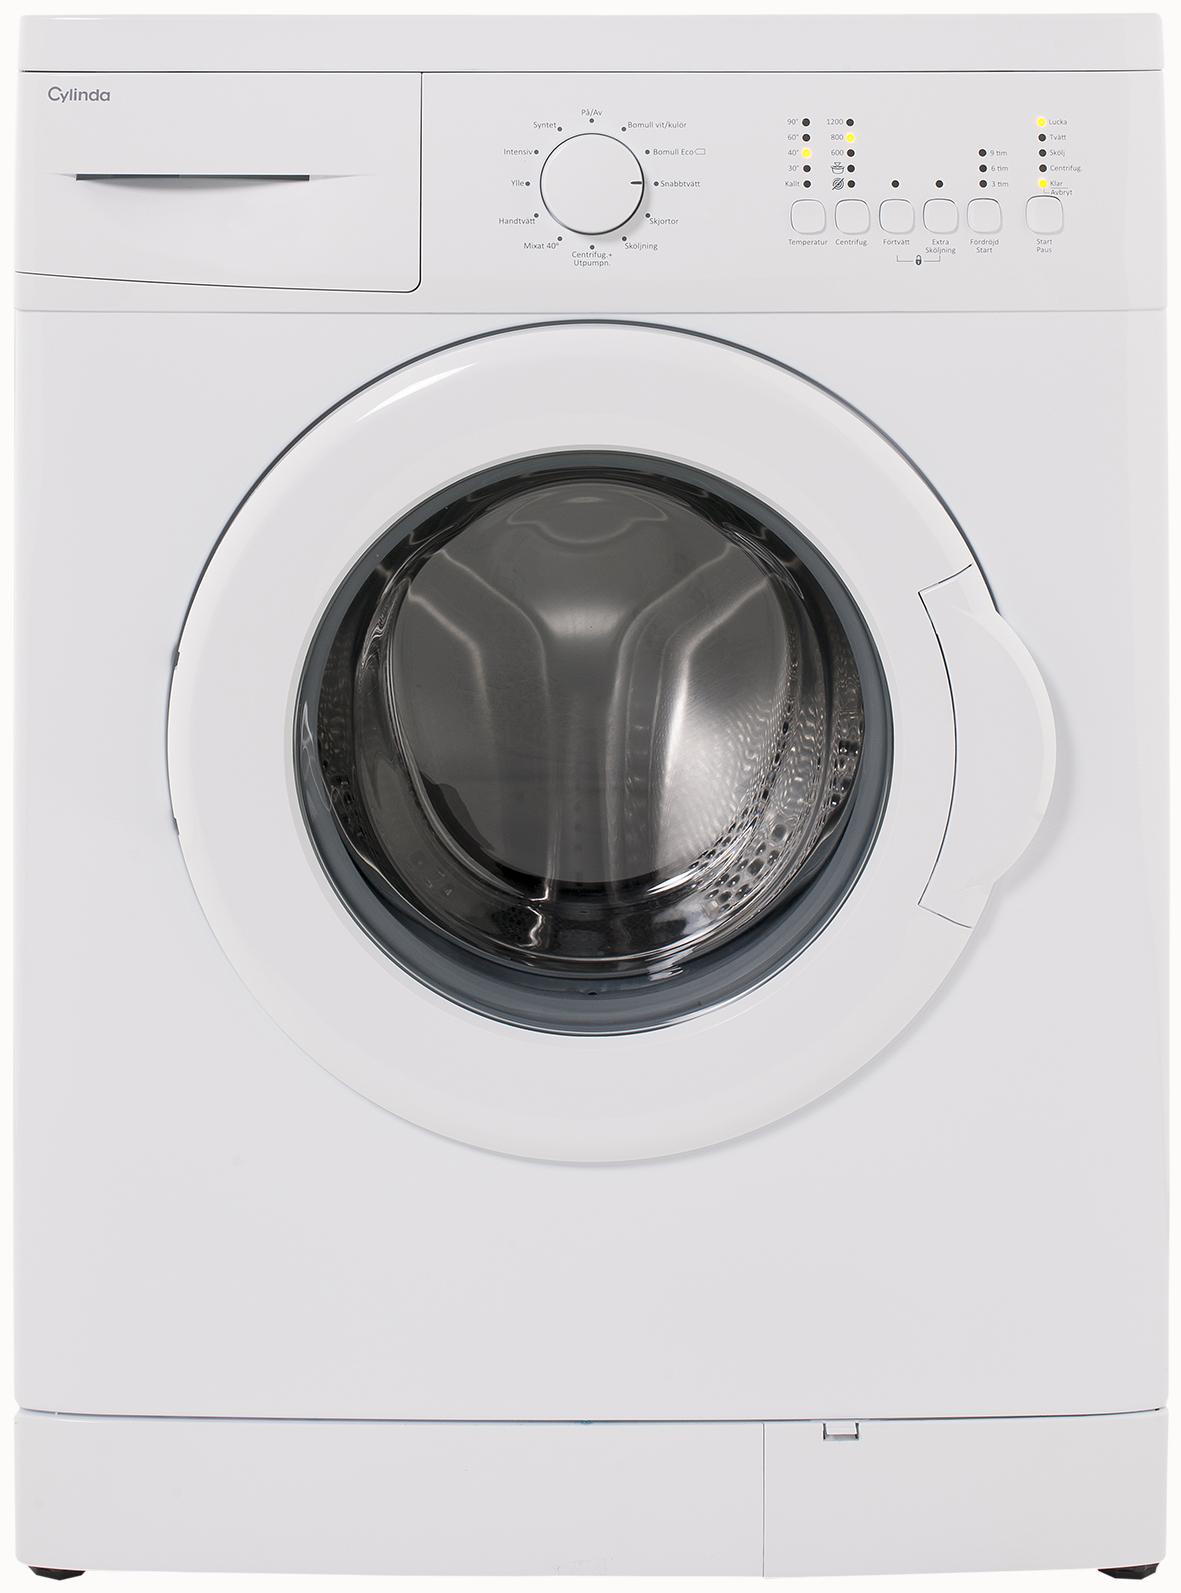 Cylinda tvättmaskin tömmer inte vatten